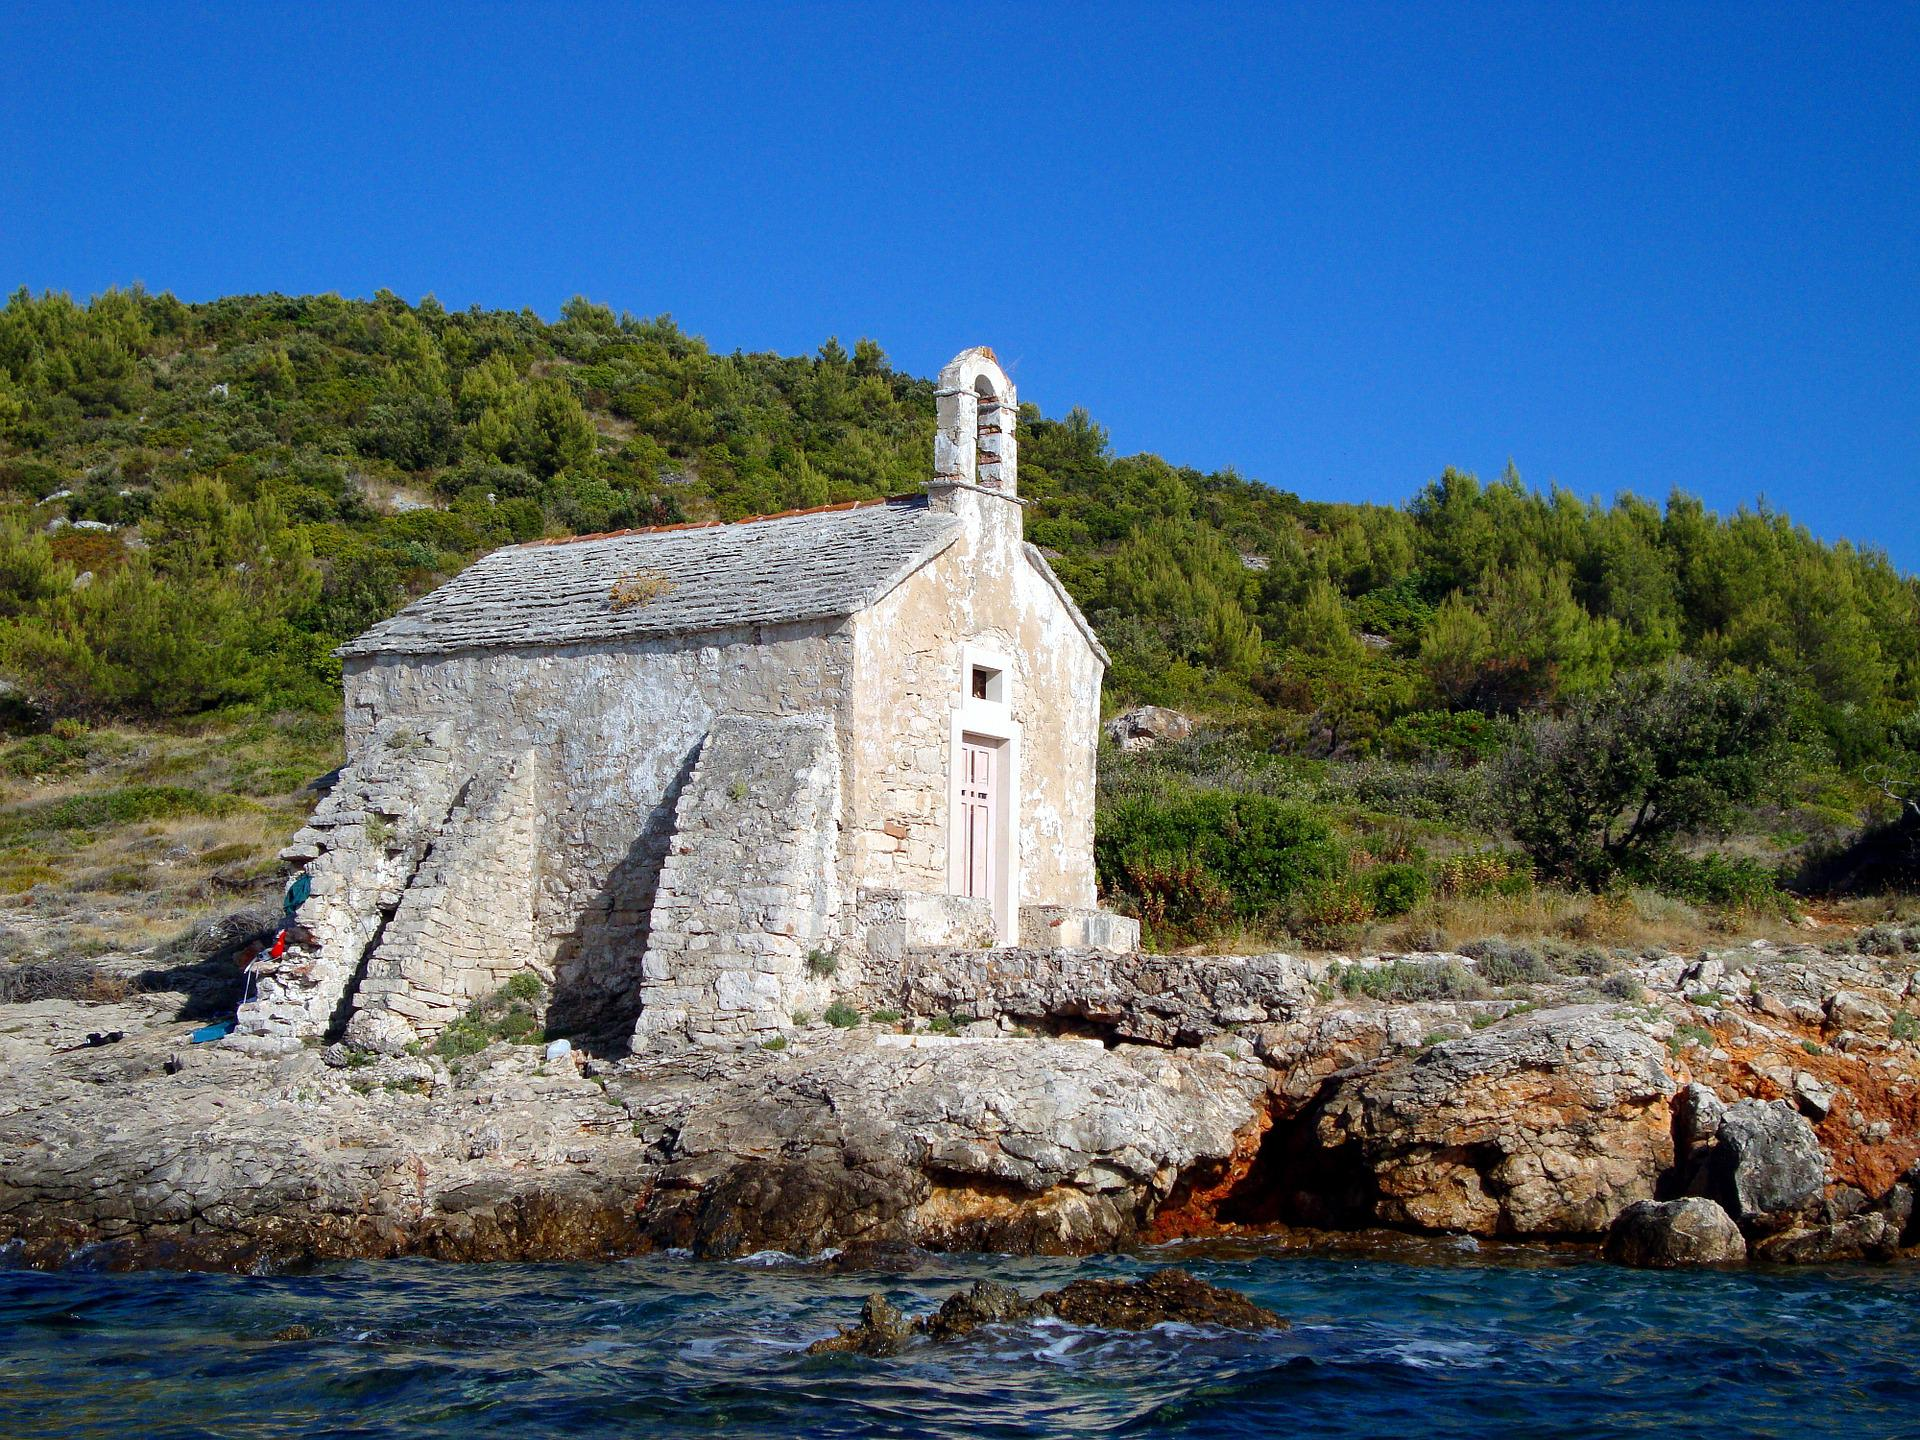 Busreis eilanden van Kroatië Hvar rondreis